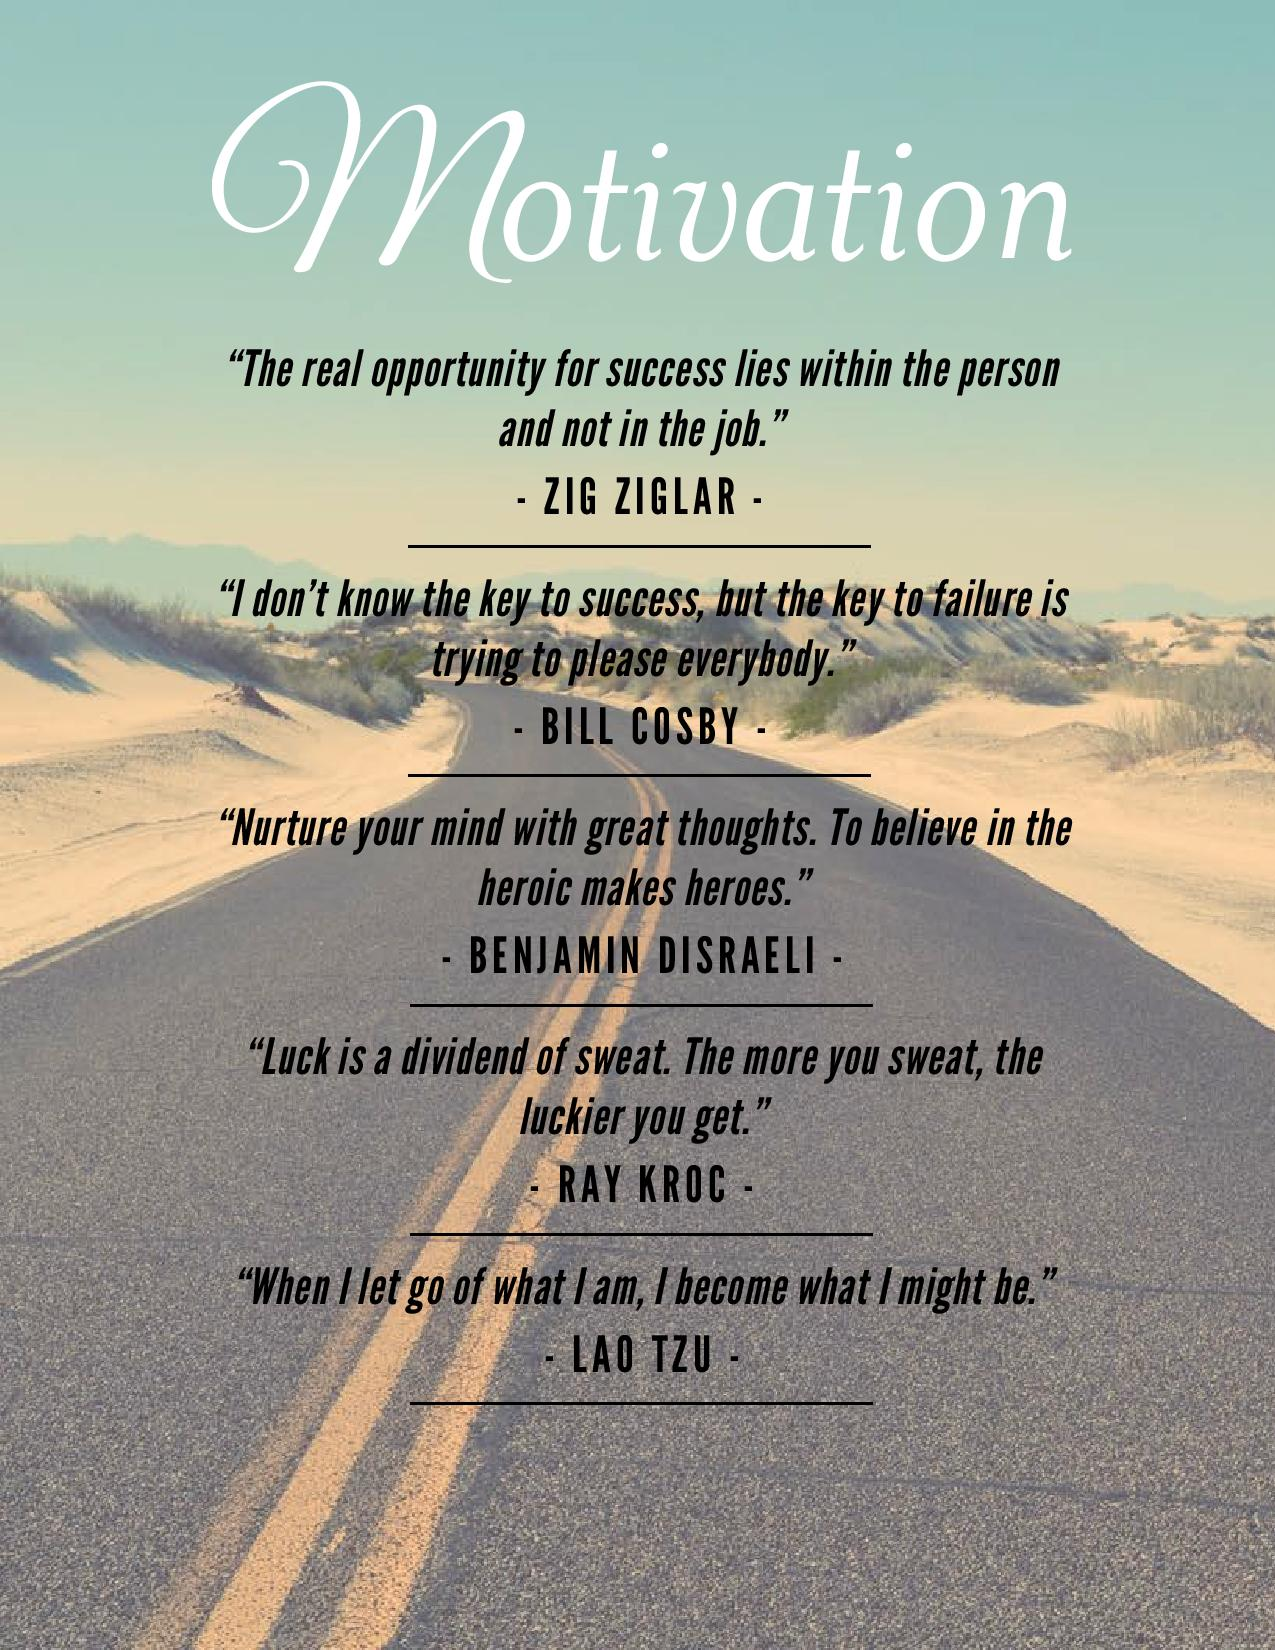 motivational quotations images pictures - photo #10